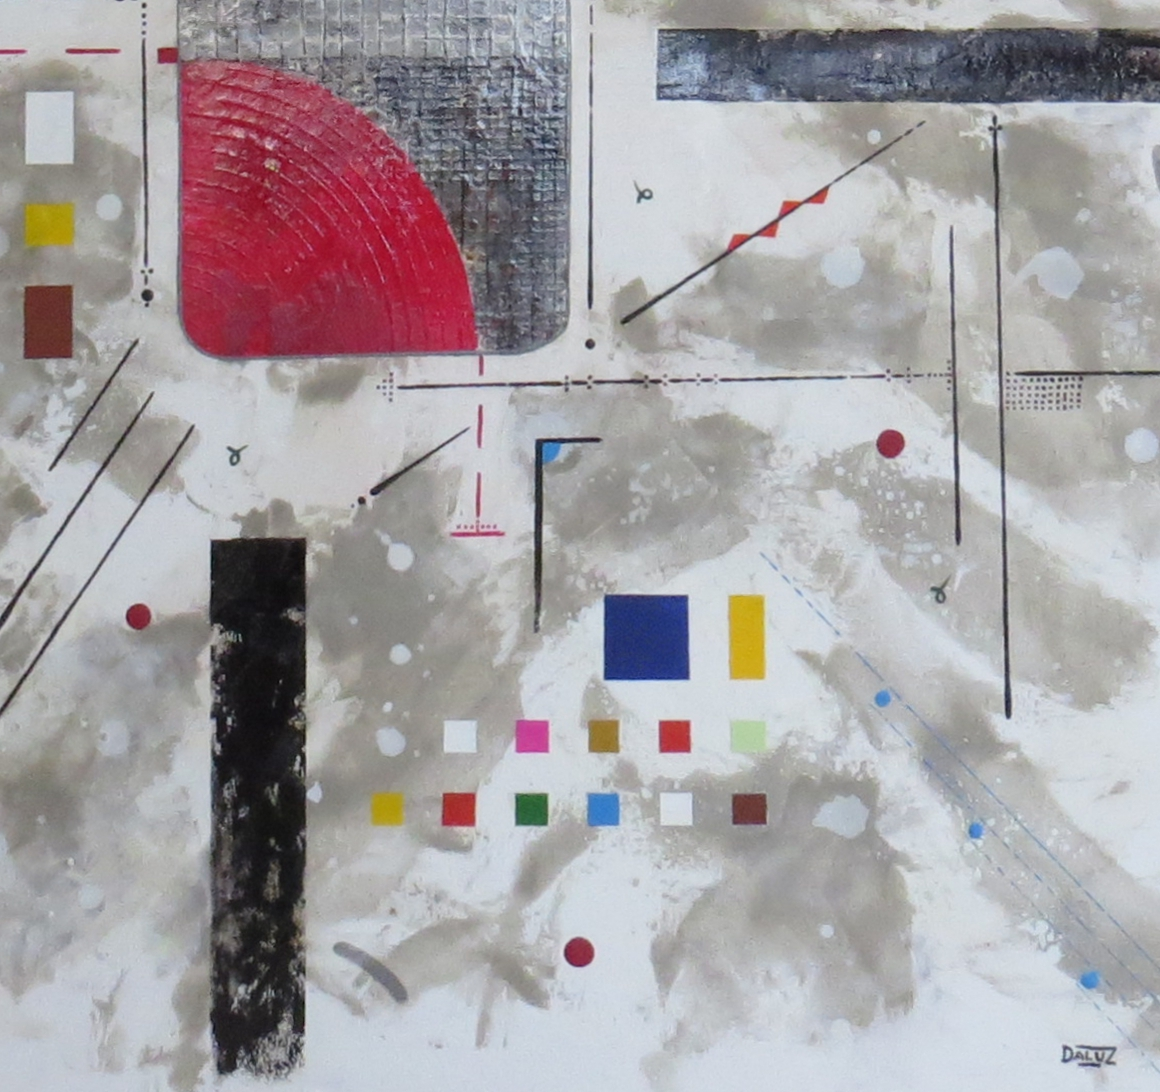 bunker sidéral - zoom5 - DALUZ GALEGO - peinture abstraite